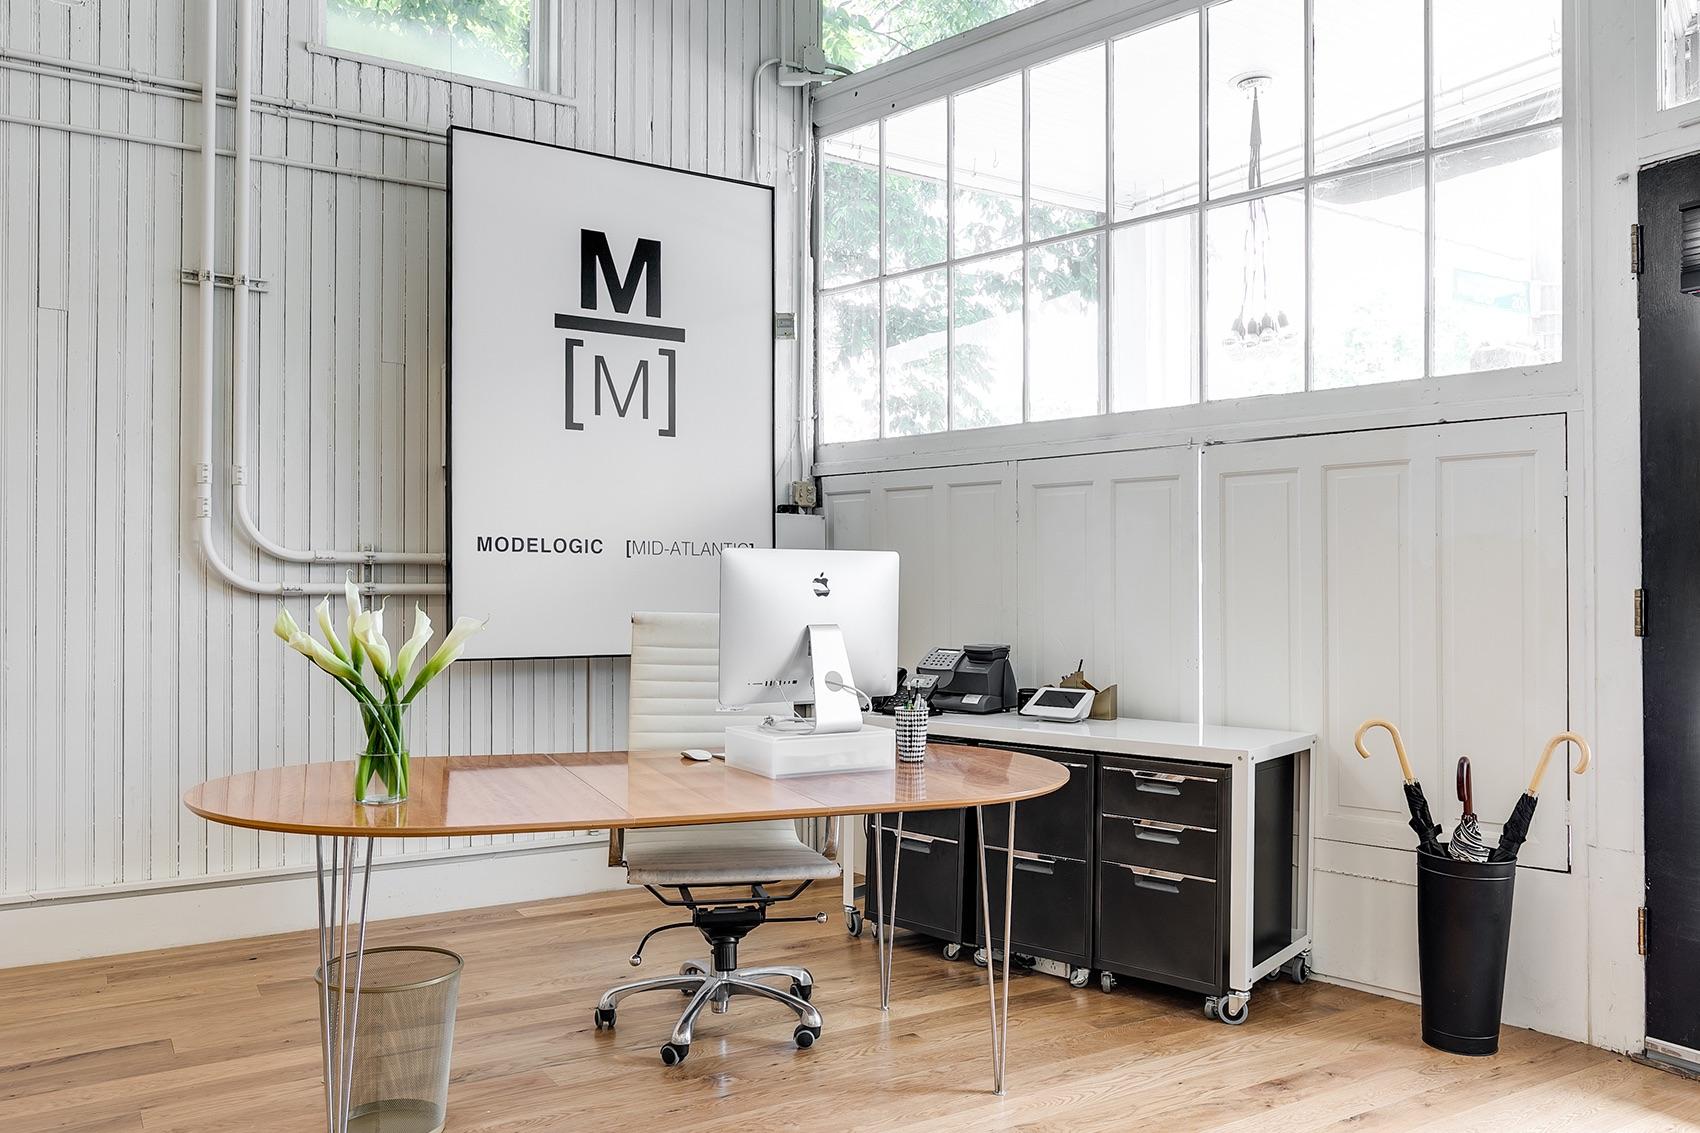 modelogic-richmond-office-4